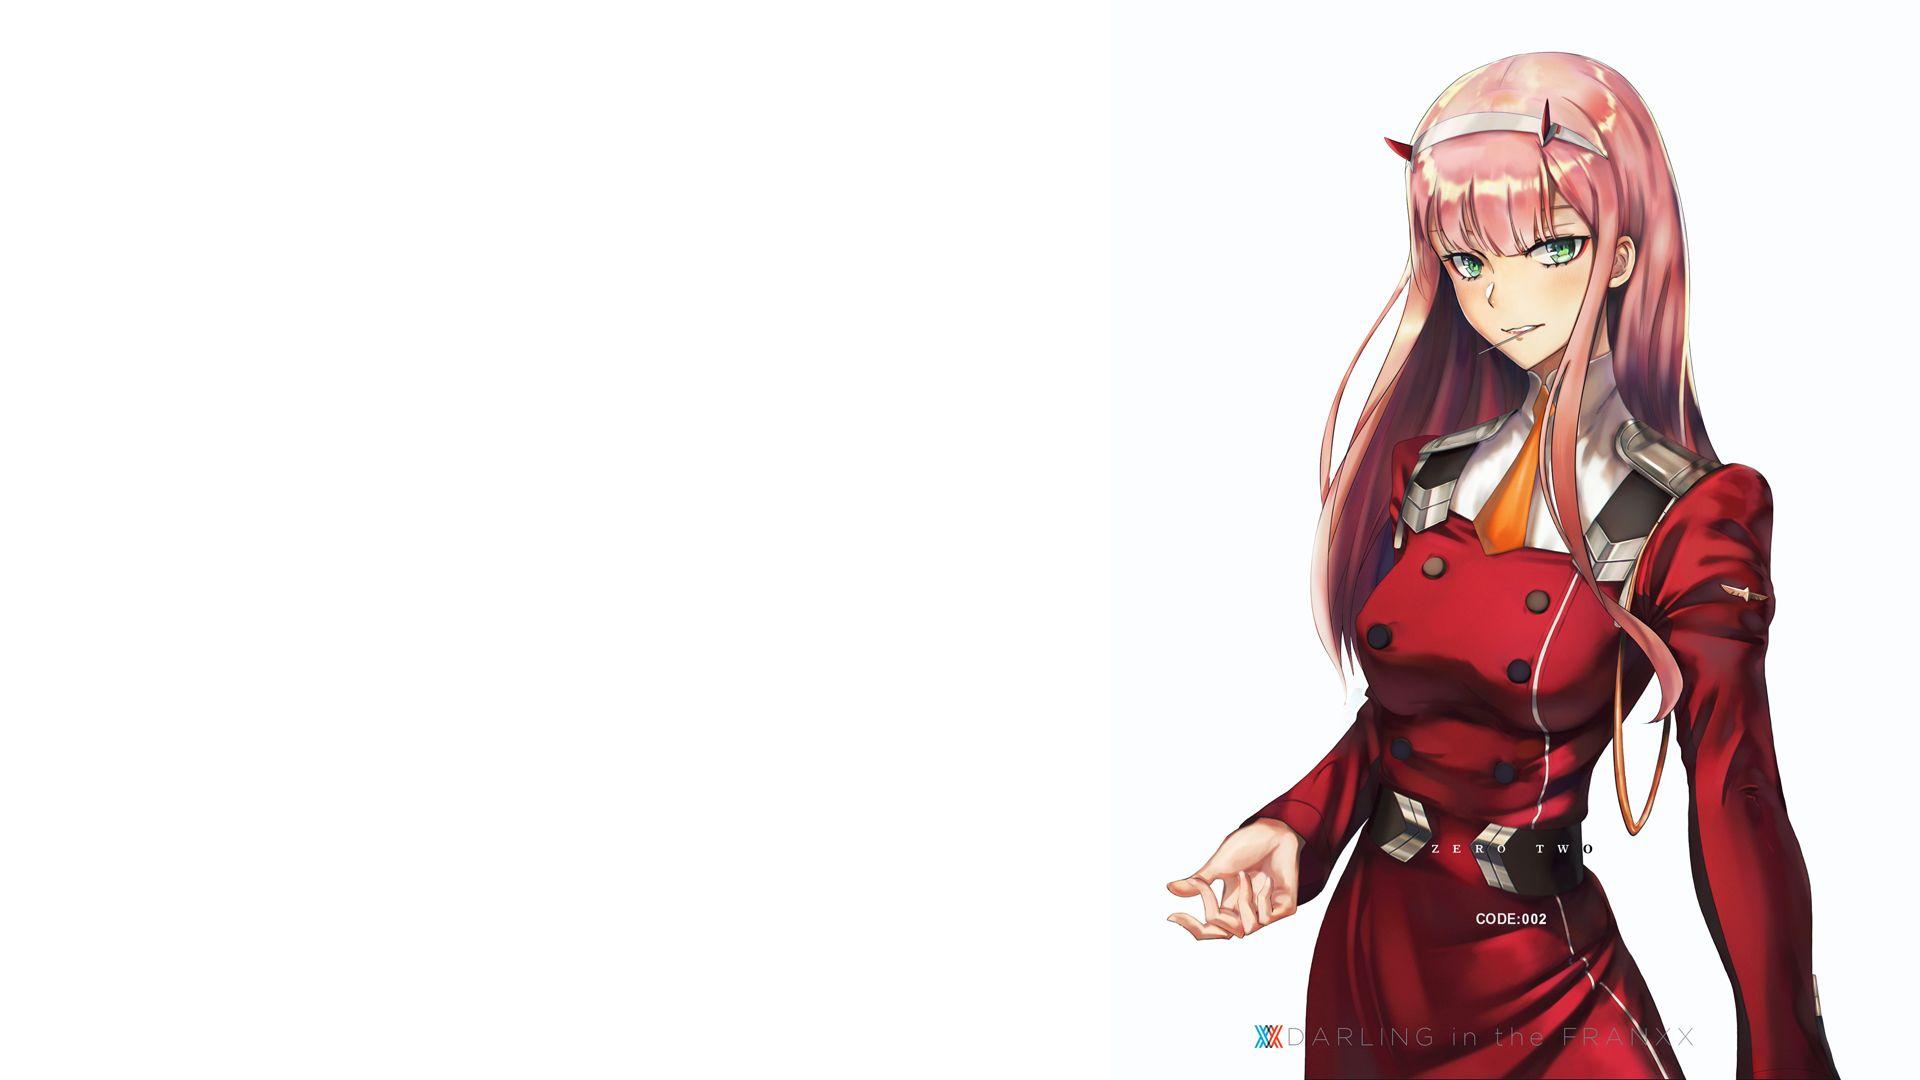 Anime Zero Two Darling In The Franxx